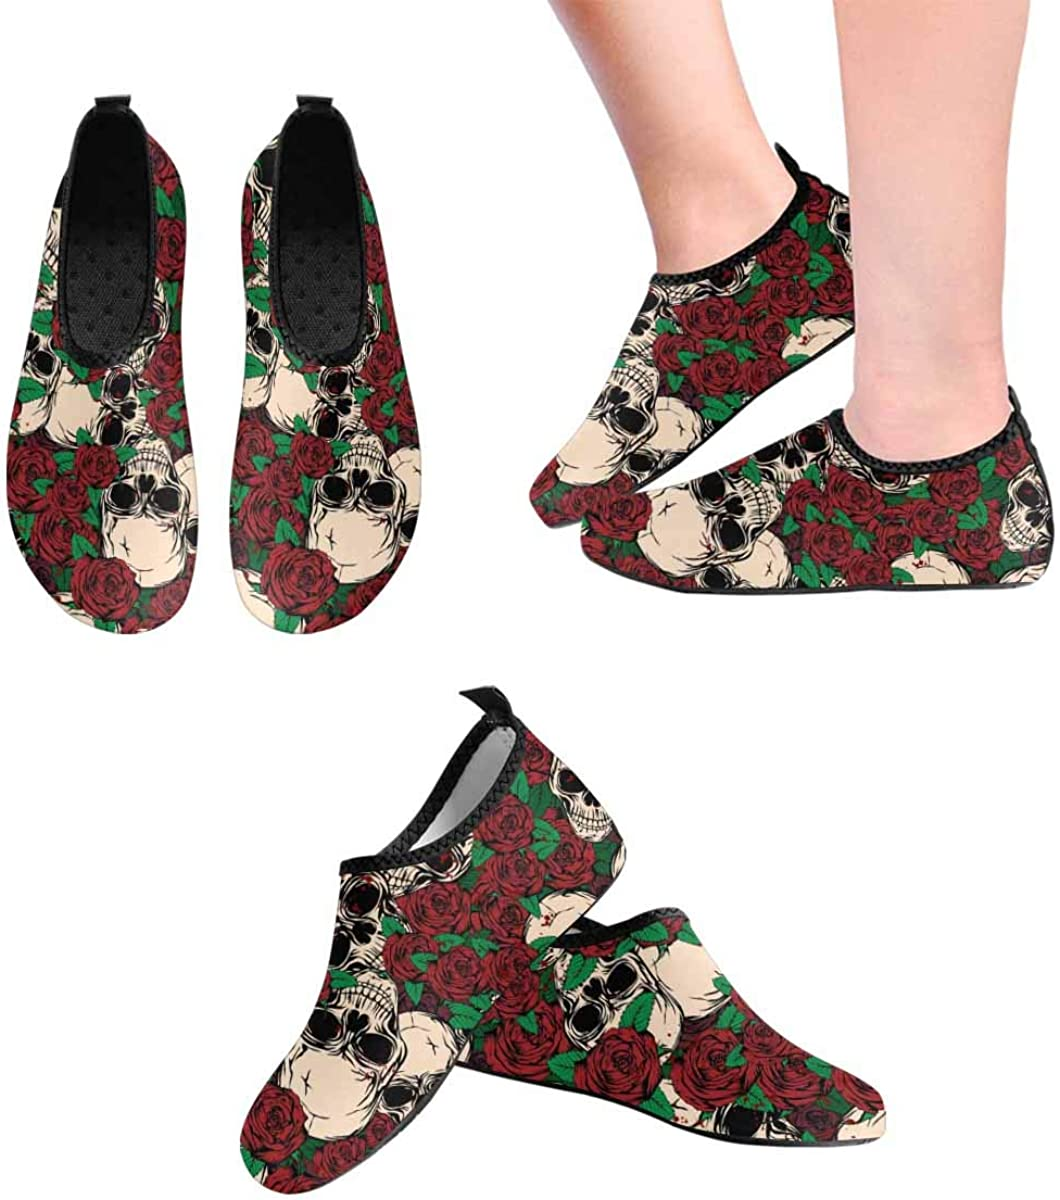 INTERESTPRINT Mens Quick Dry Barefoot Aqua Shoes Grunge Skull Rose Lightweight Barefoot Shoes